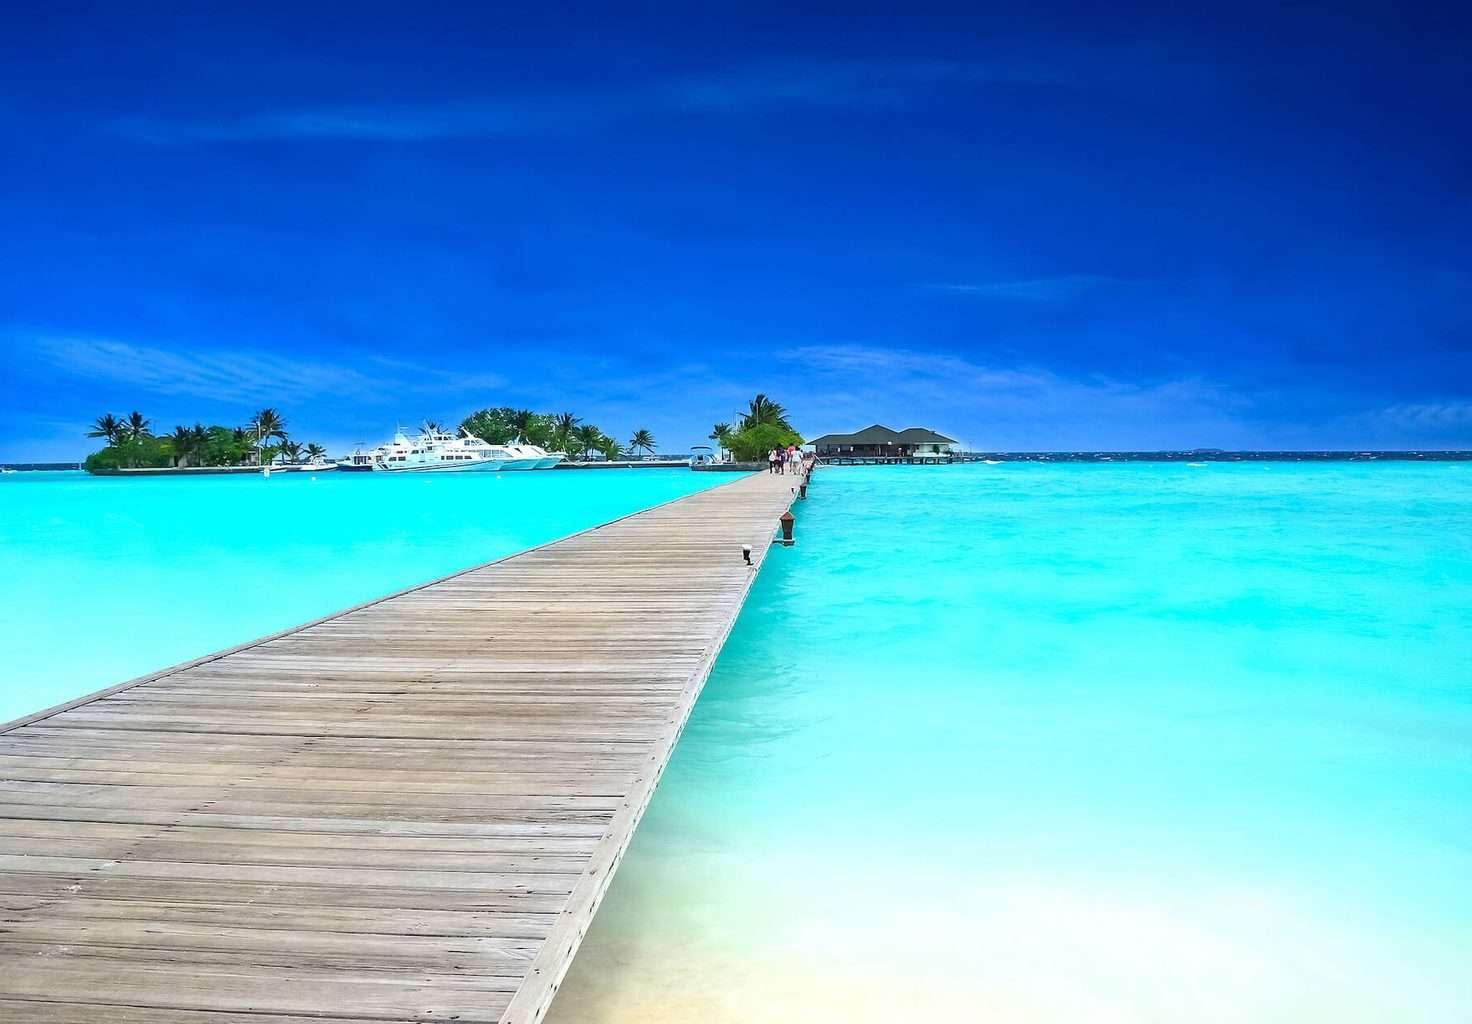 Clear sea and jetty at Six Senses Laamu in Maldives